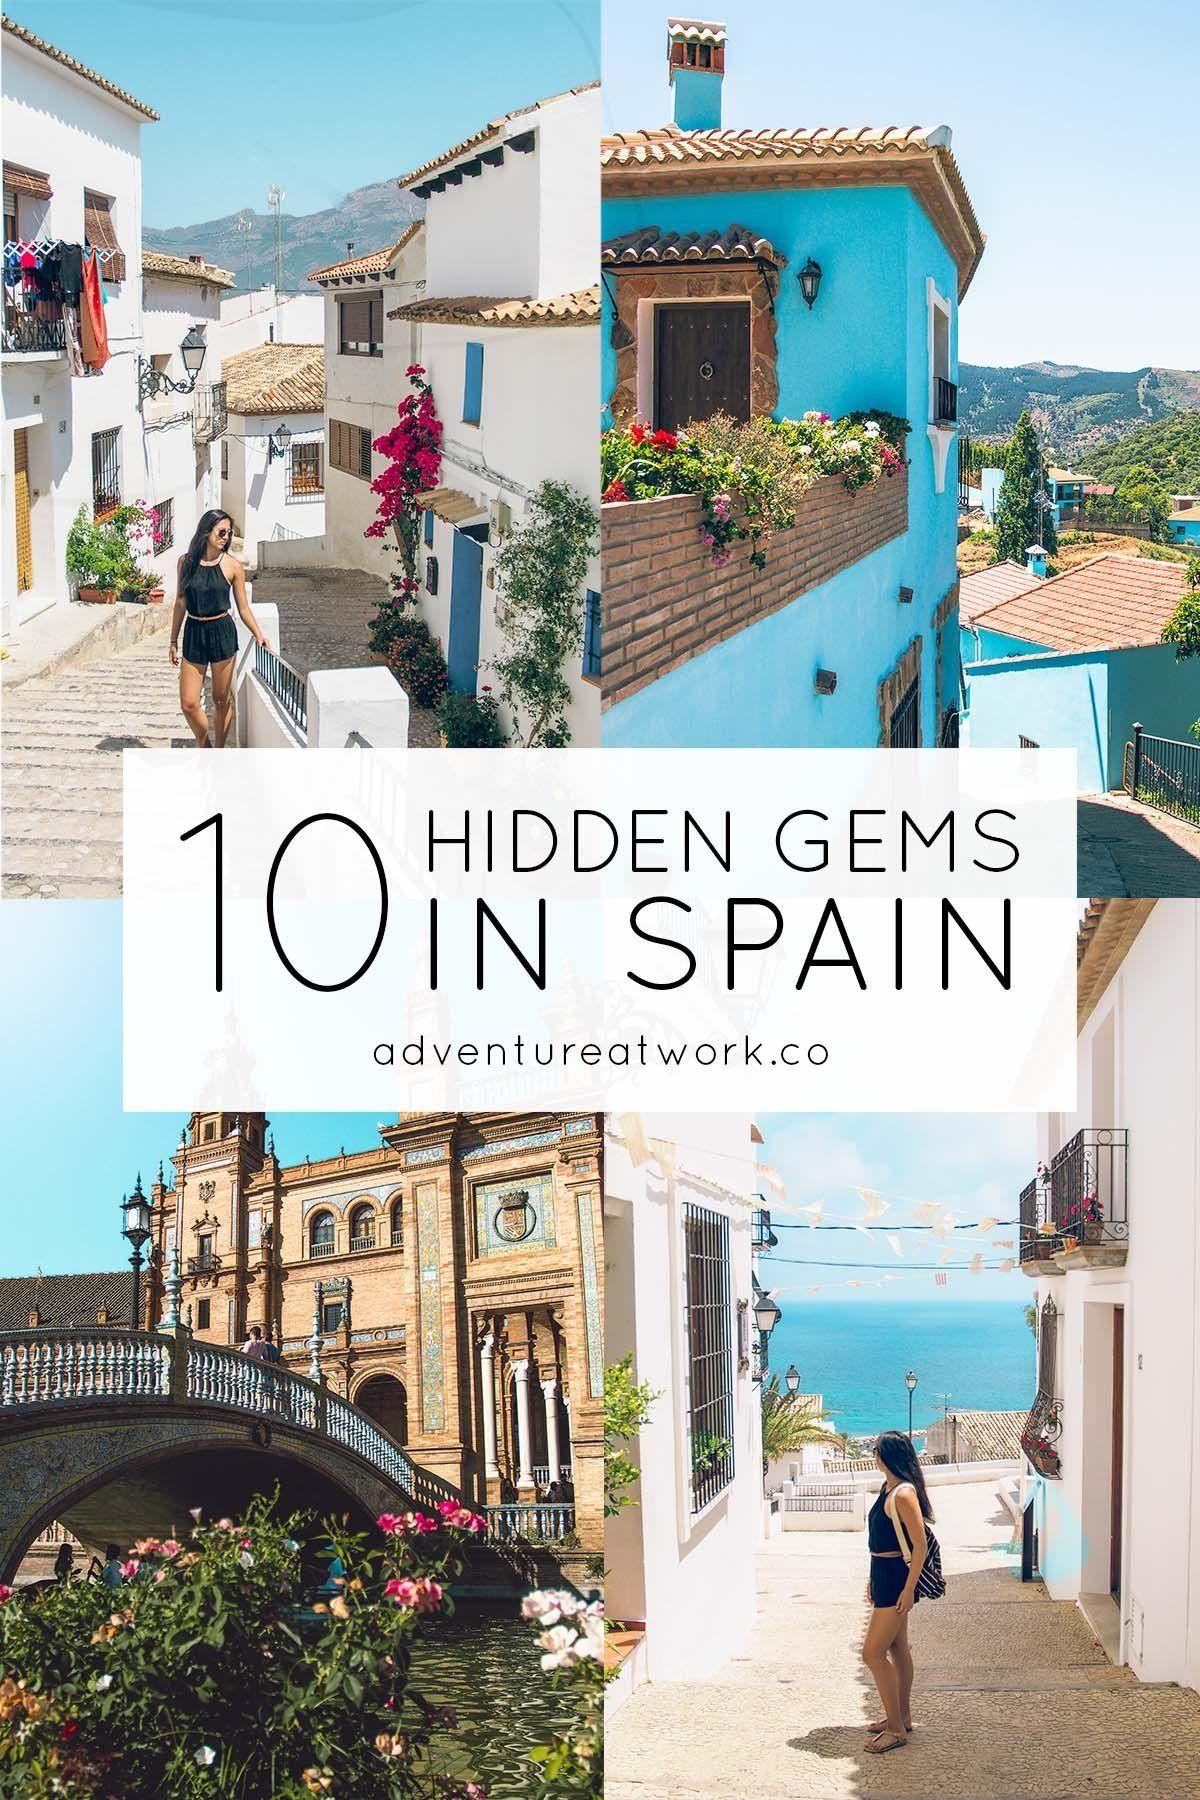 10 Hidden Gems In Spain That You Need To Visit - Adventure at Work #Spain